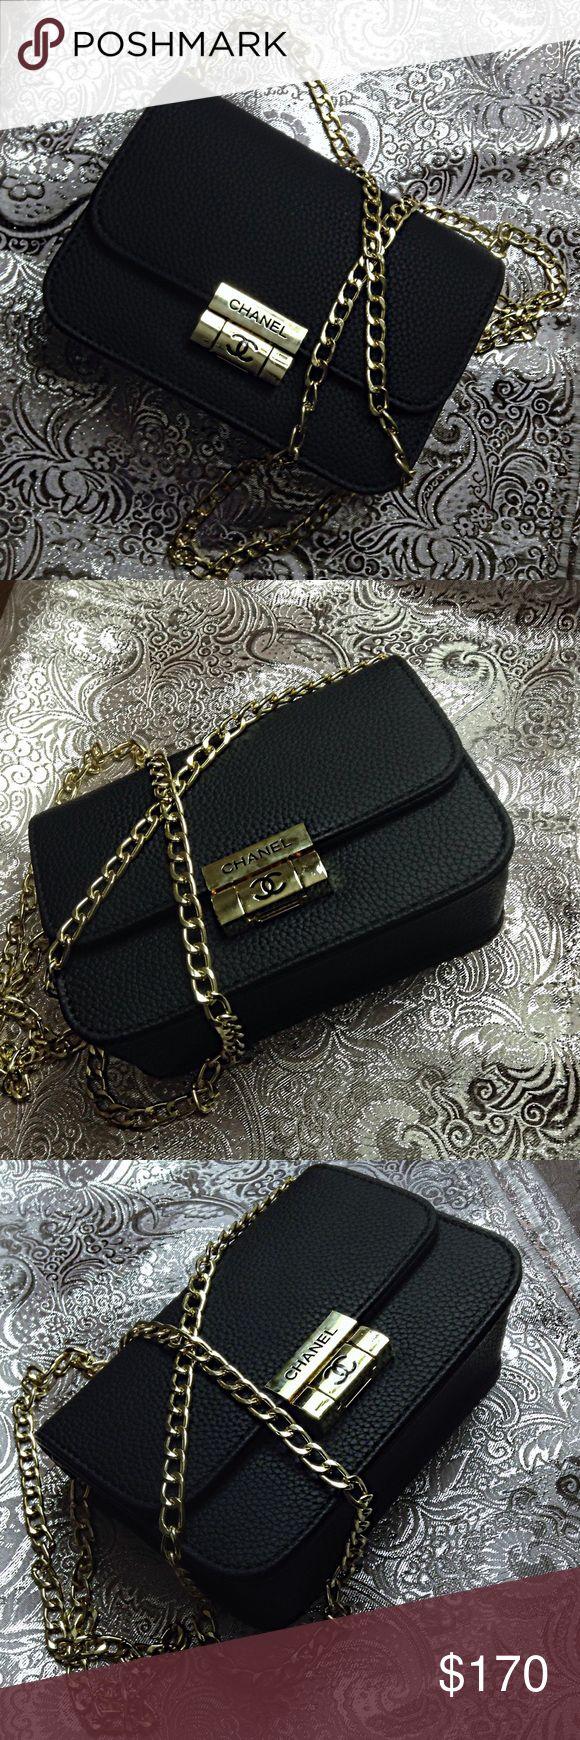 Mini bag Mini Chanel bag, Chanel mini purse. Black leather bag, Black mini bag. Evening bag, Black leather clutch. Crossbody, shoulder bag. Black Chanel. Wallet on chain, Gold chain bag. New. No, it's not... No, this isn't. Please read again Bags Mini Bags